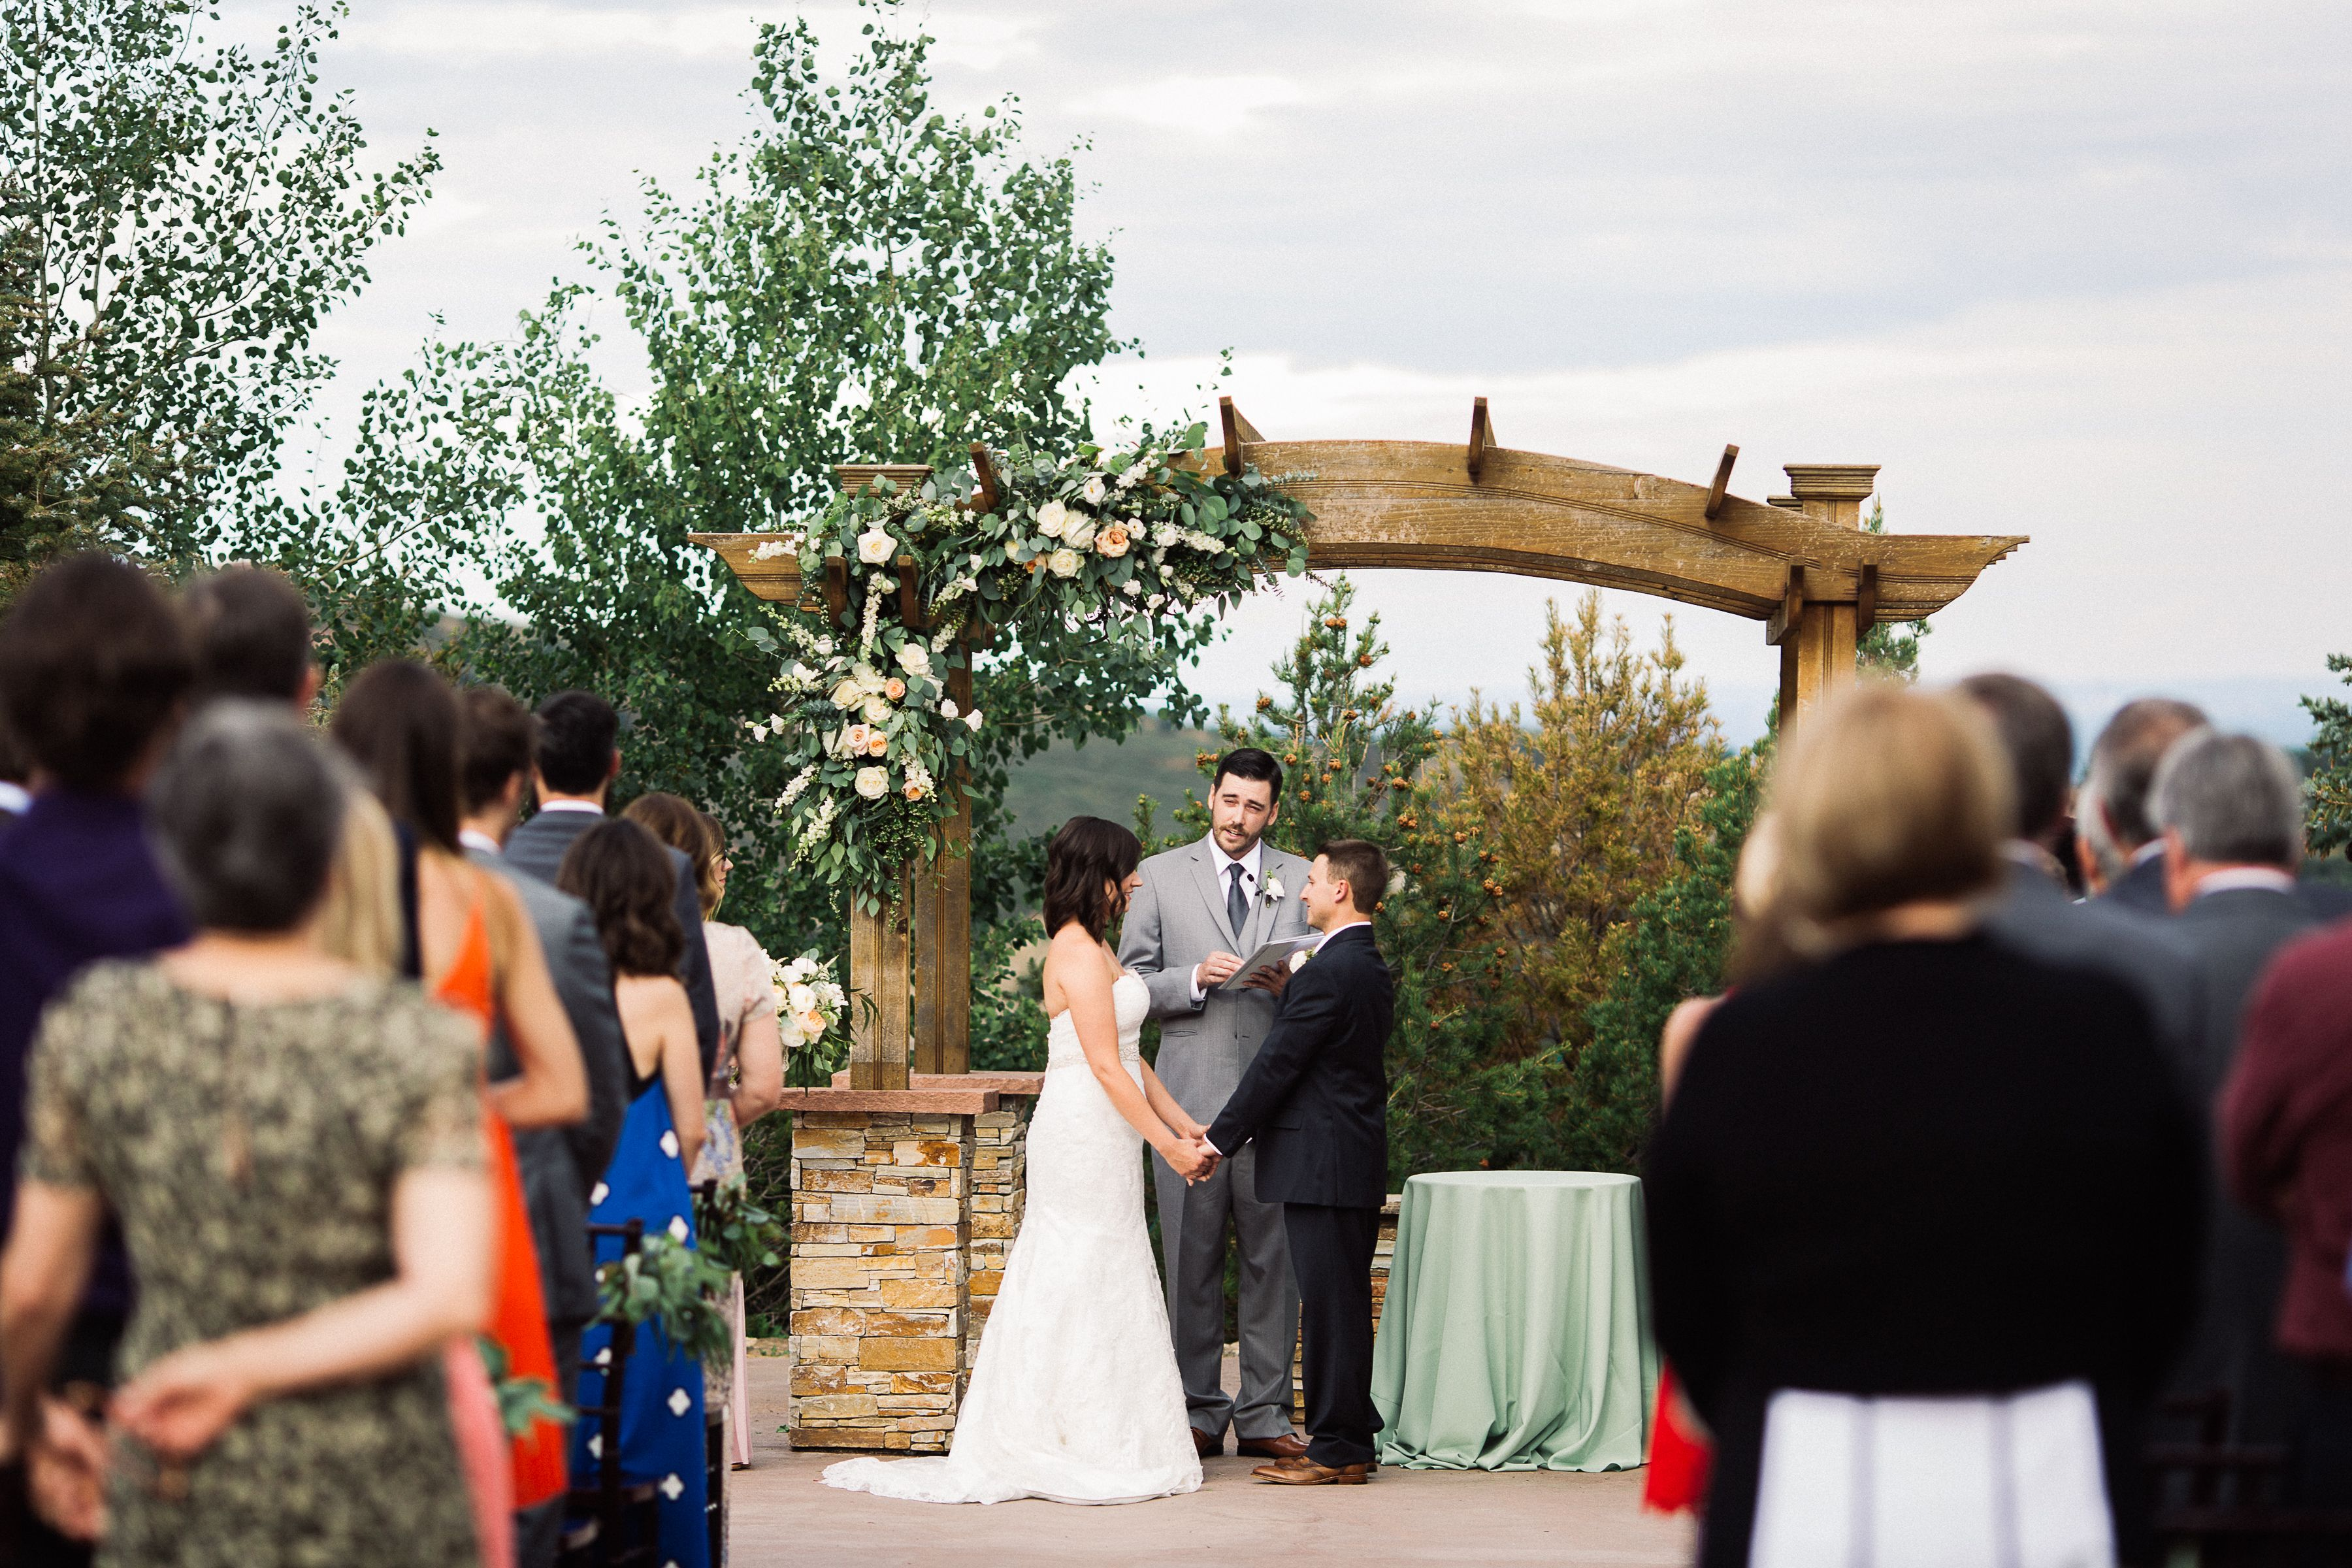 Wedding ceremony at willow ridge manor wedding venue in morrison wedding ceremony at willow ridge manor wedding venue in morrison colorado colorado wedding junglespirit Images